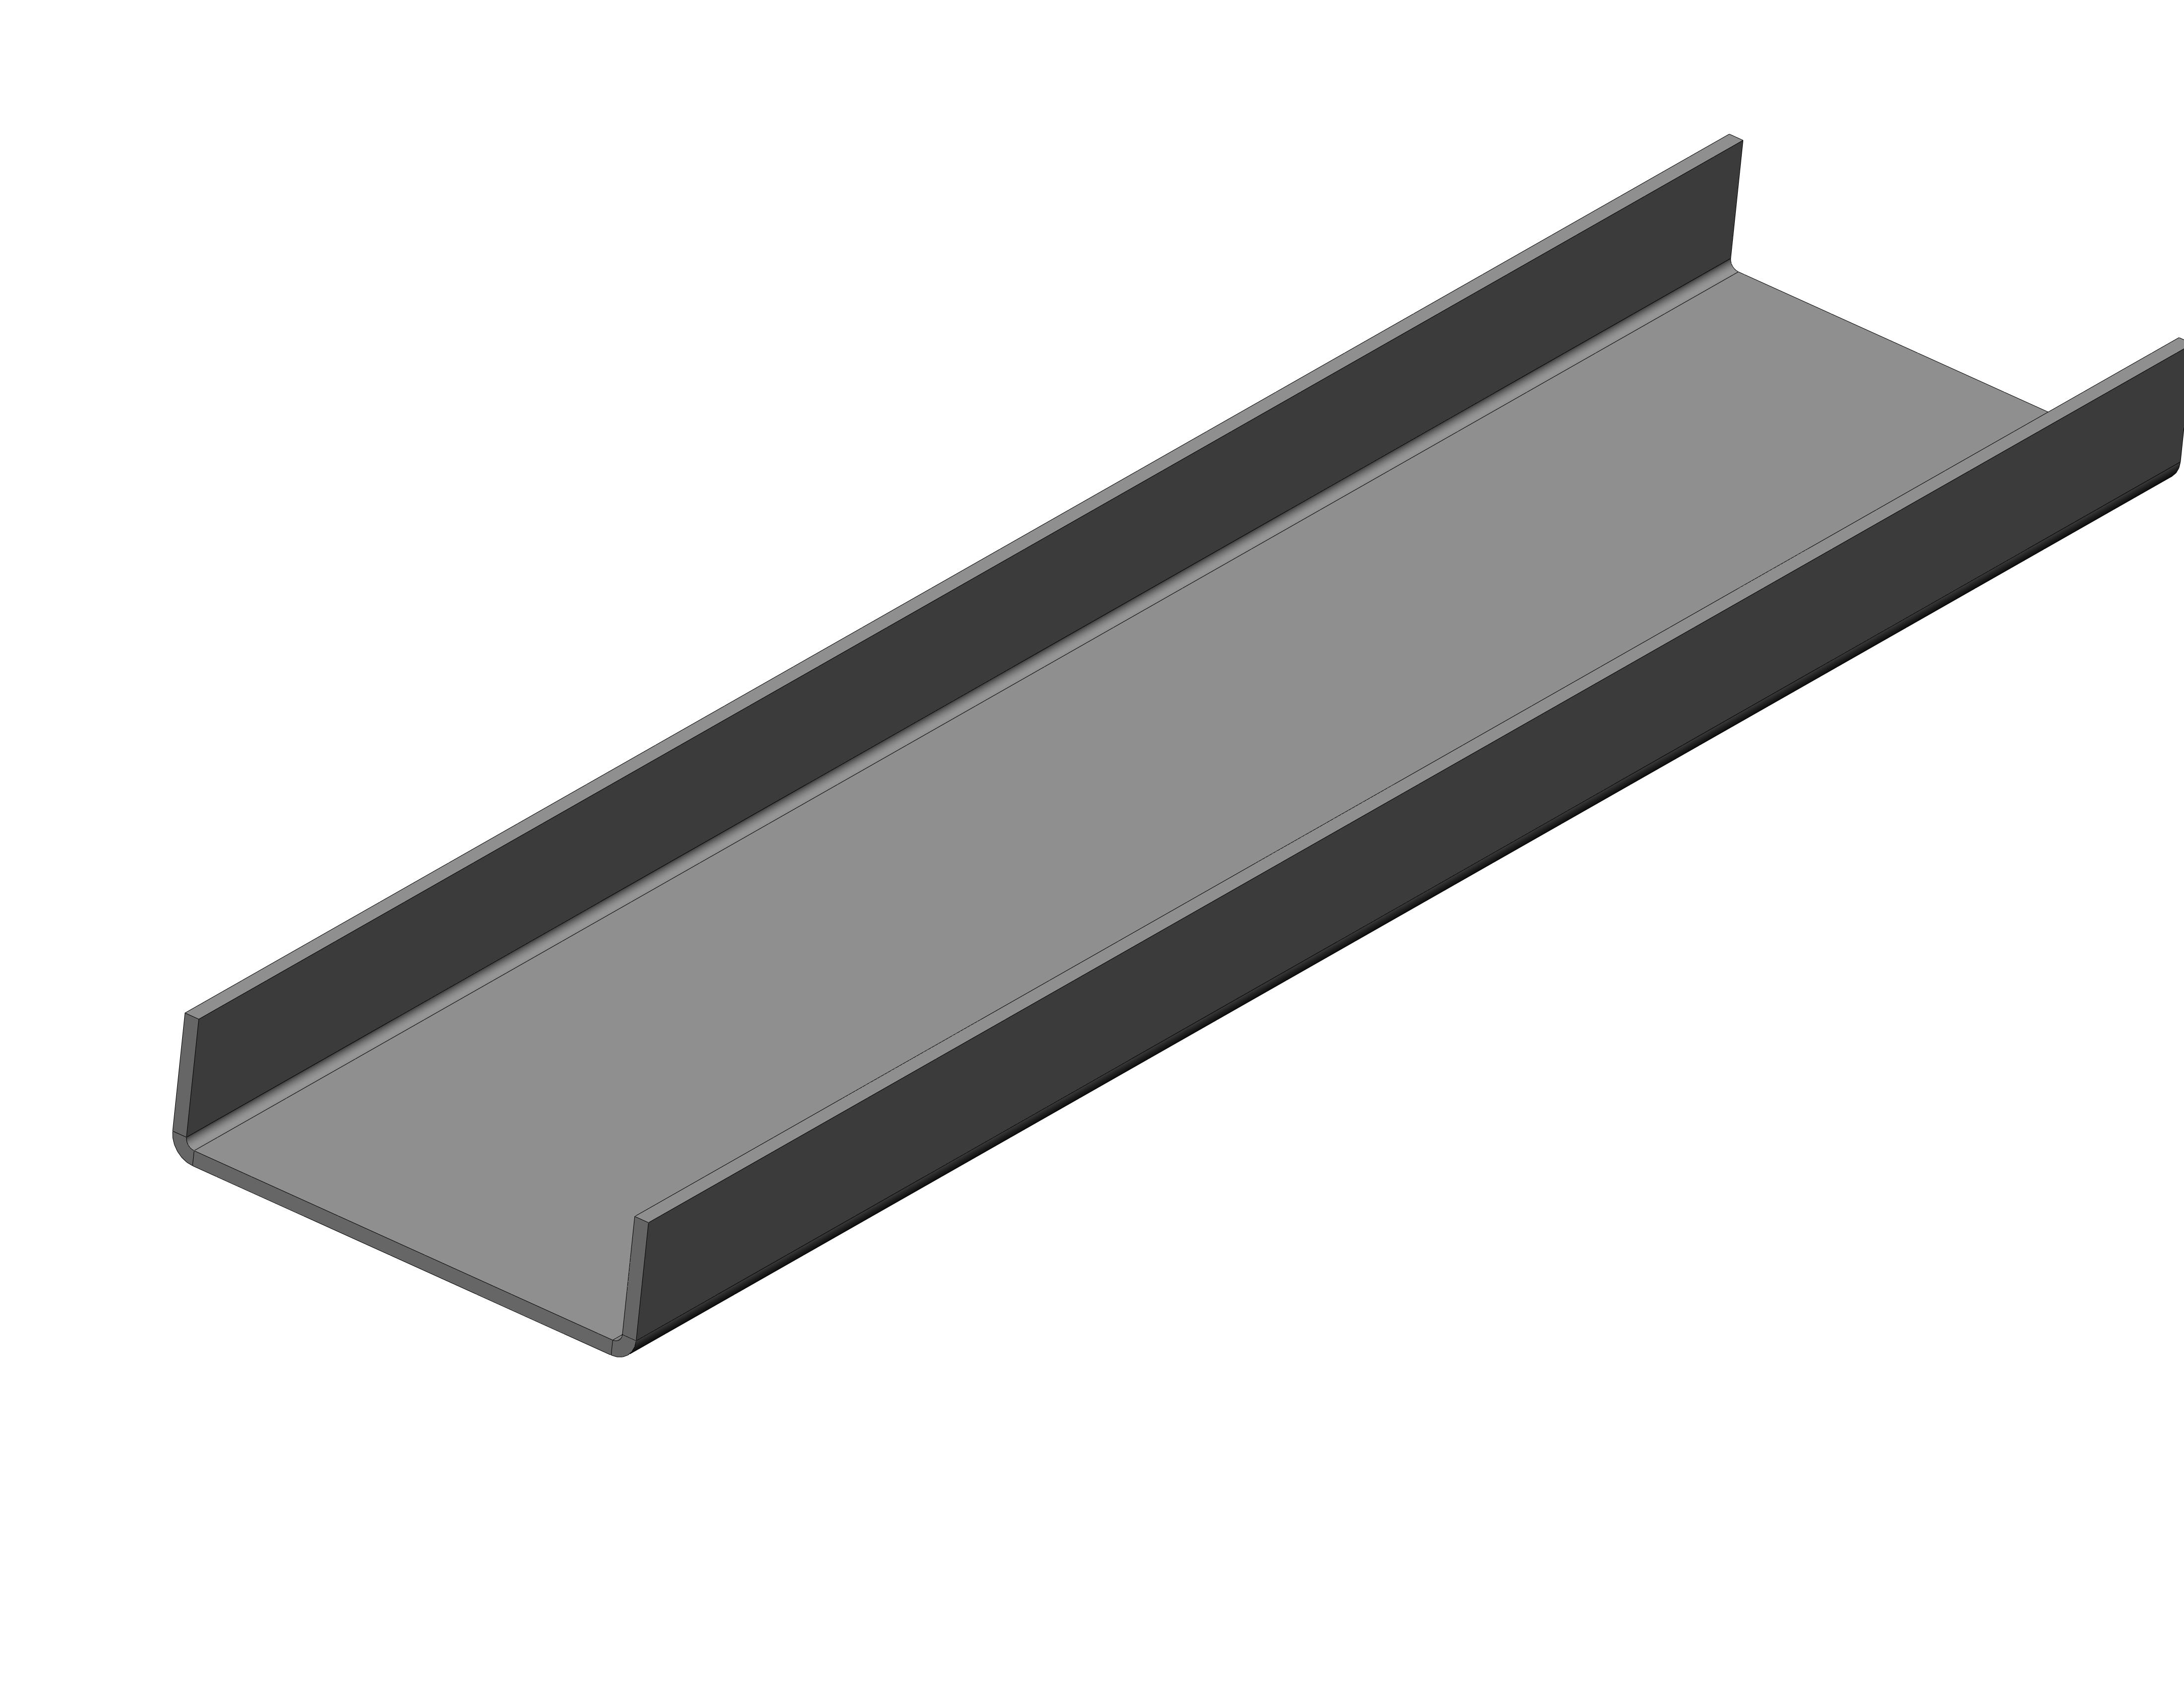 CHAPA LONGITUDINAL - (3560 X 915)